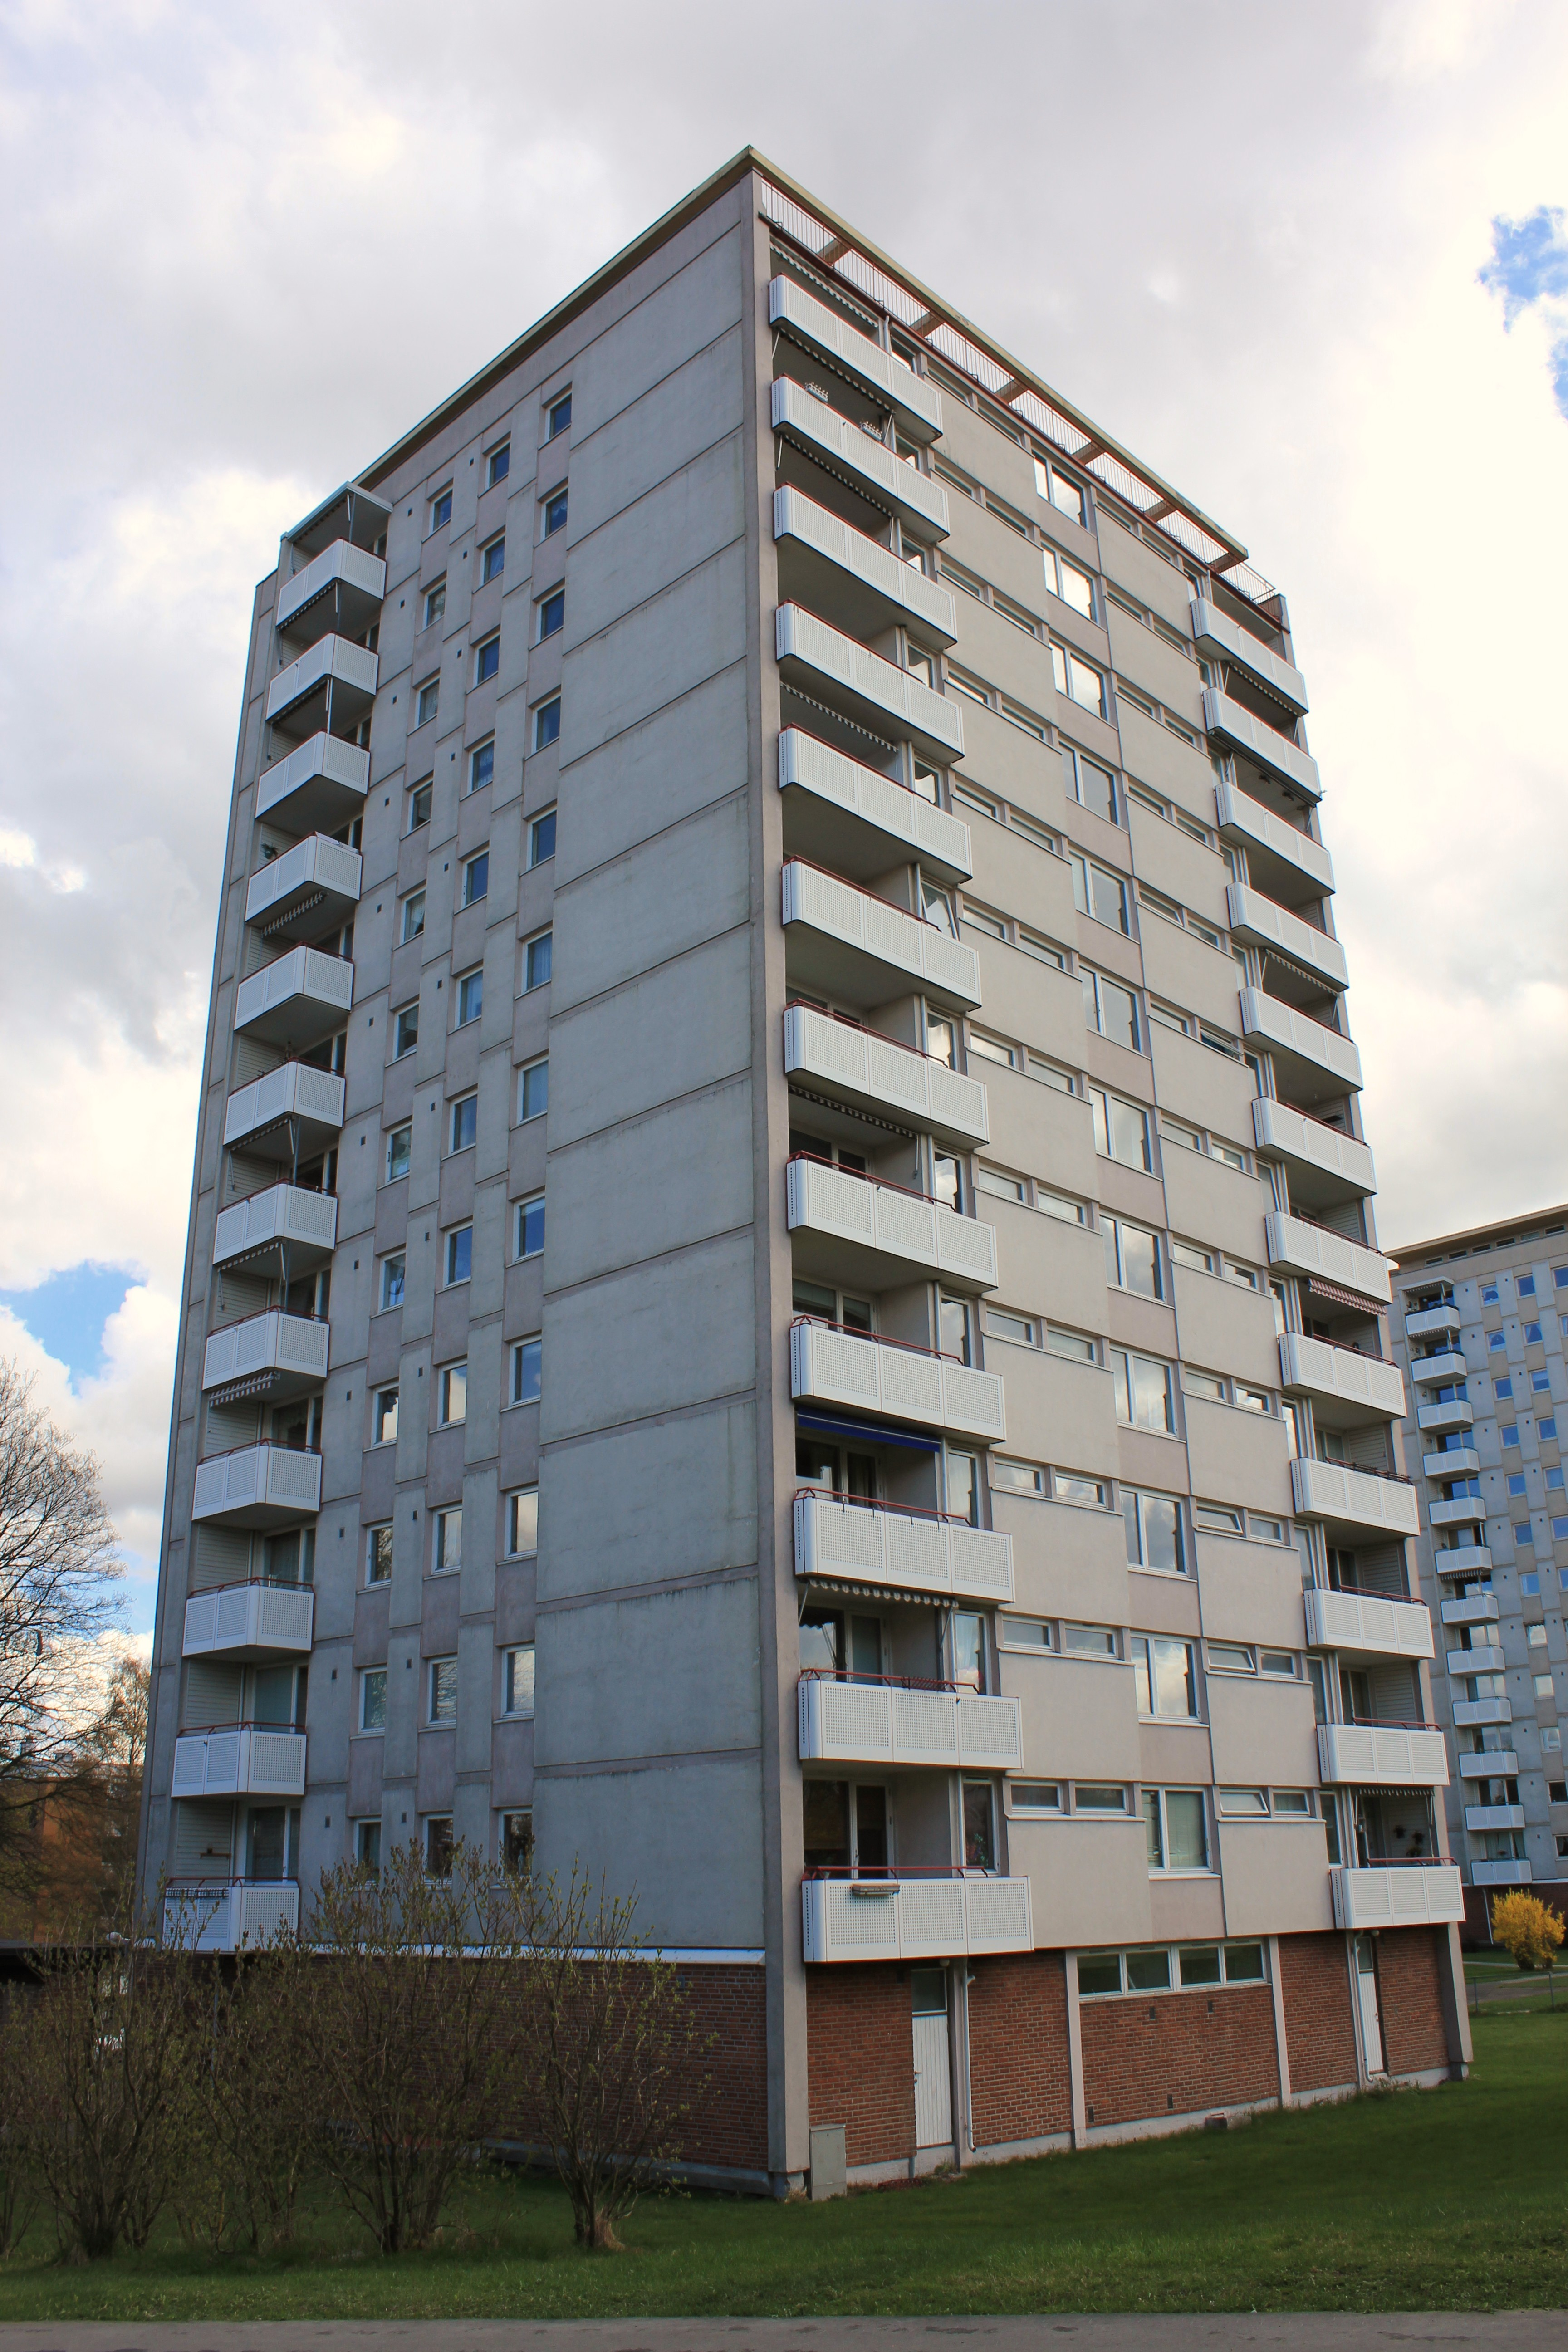 Apartment Buildings For Sale West Palm Beach